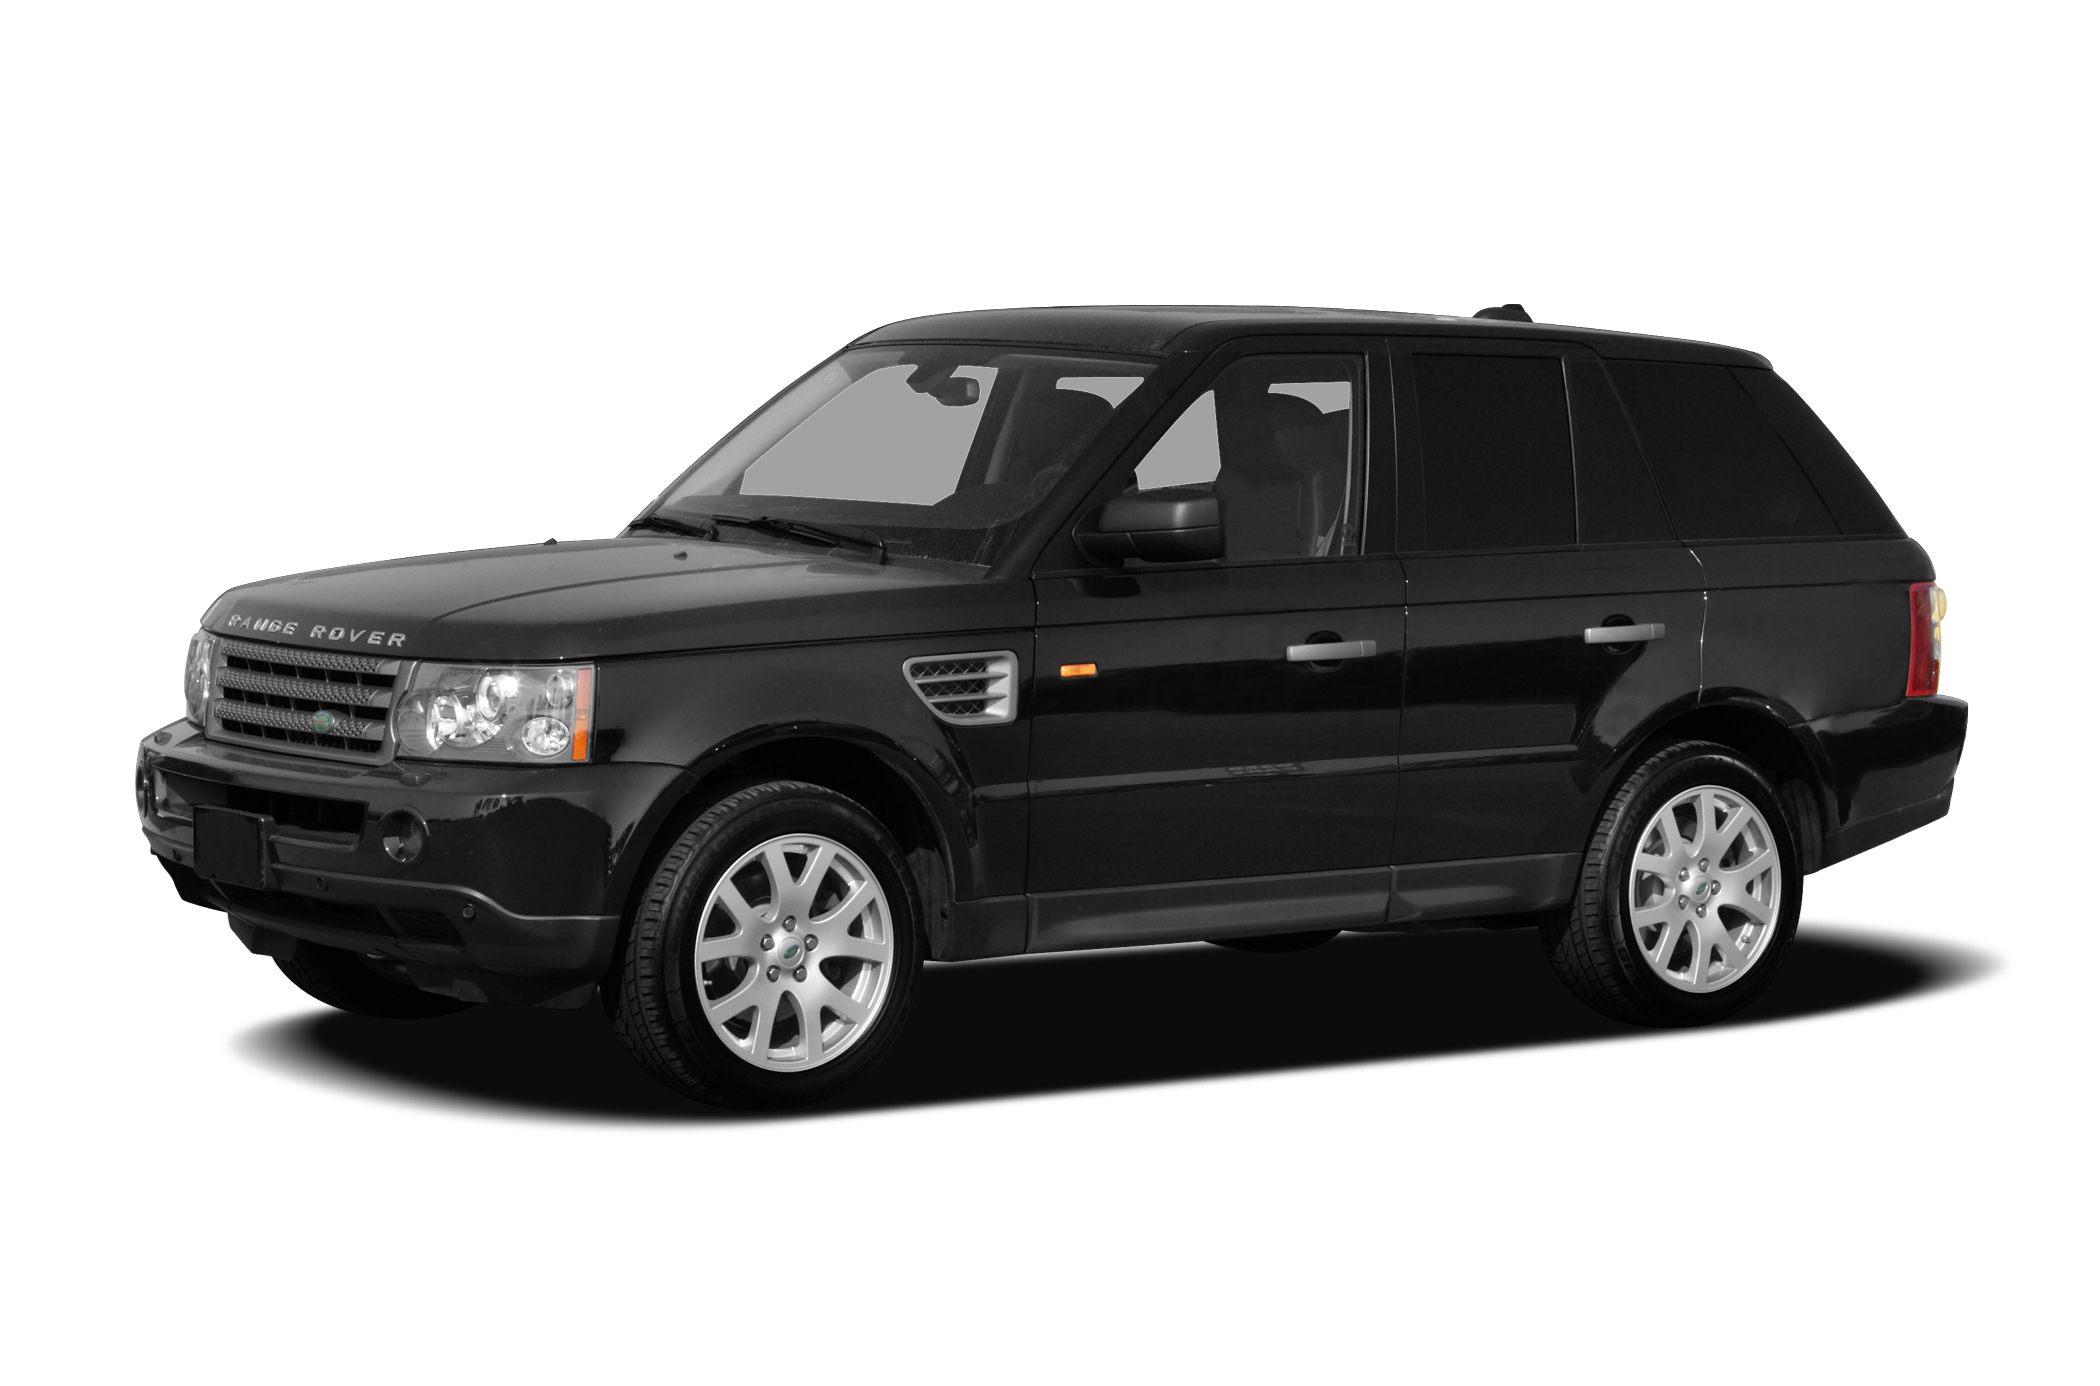 2007 Land Rover Range Rover Sport Information